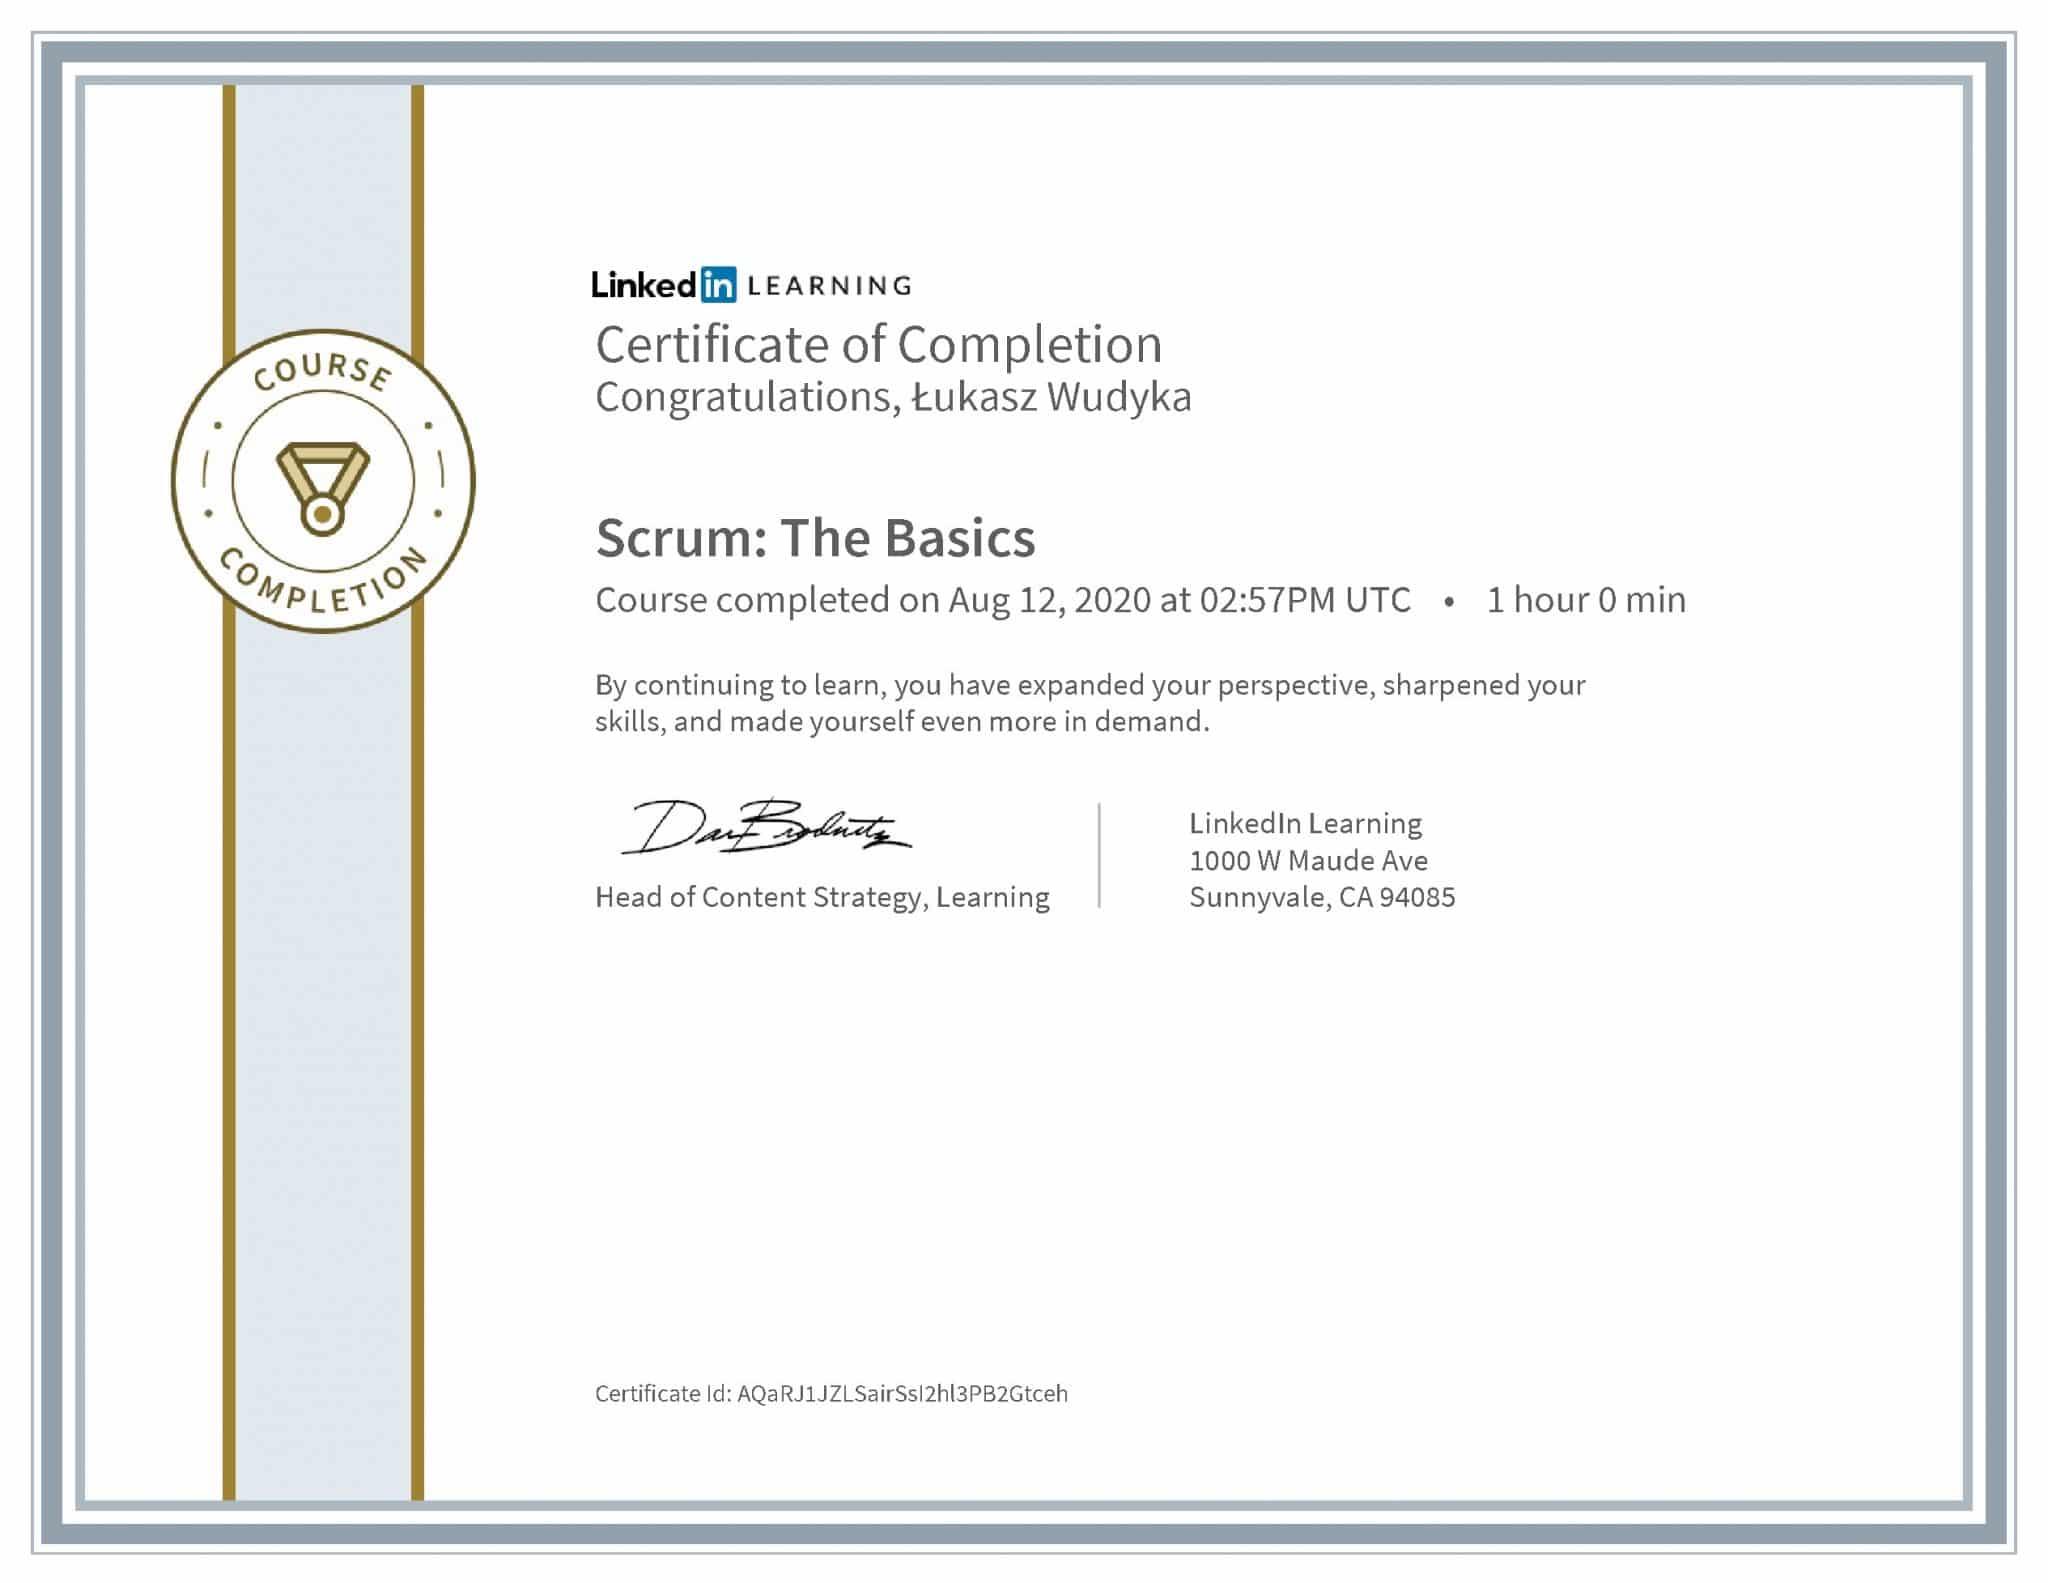 Łukasz Wudyka certyfikat LinkedIn Scrum: The Basics